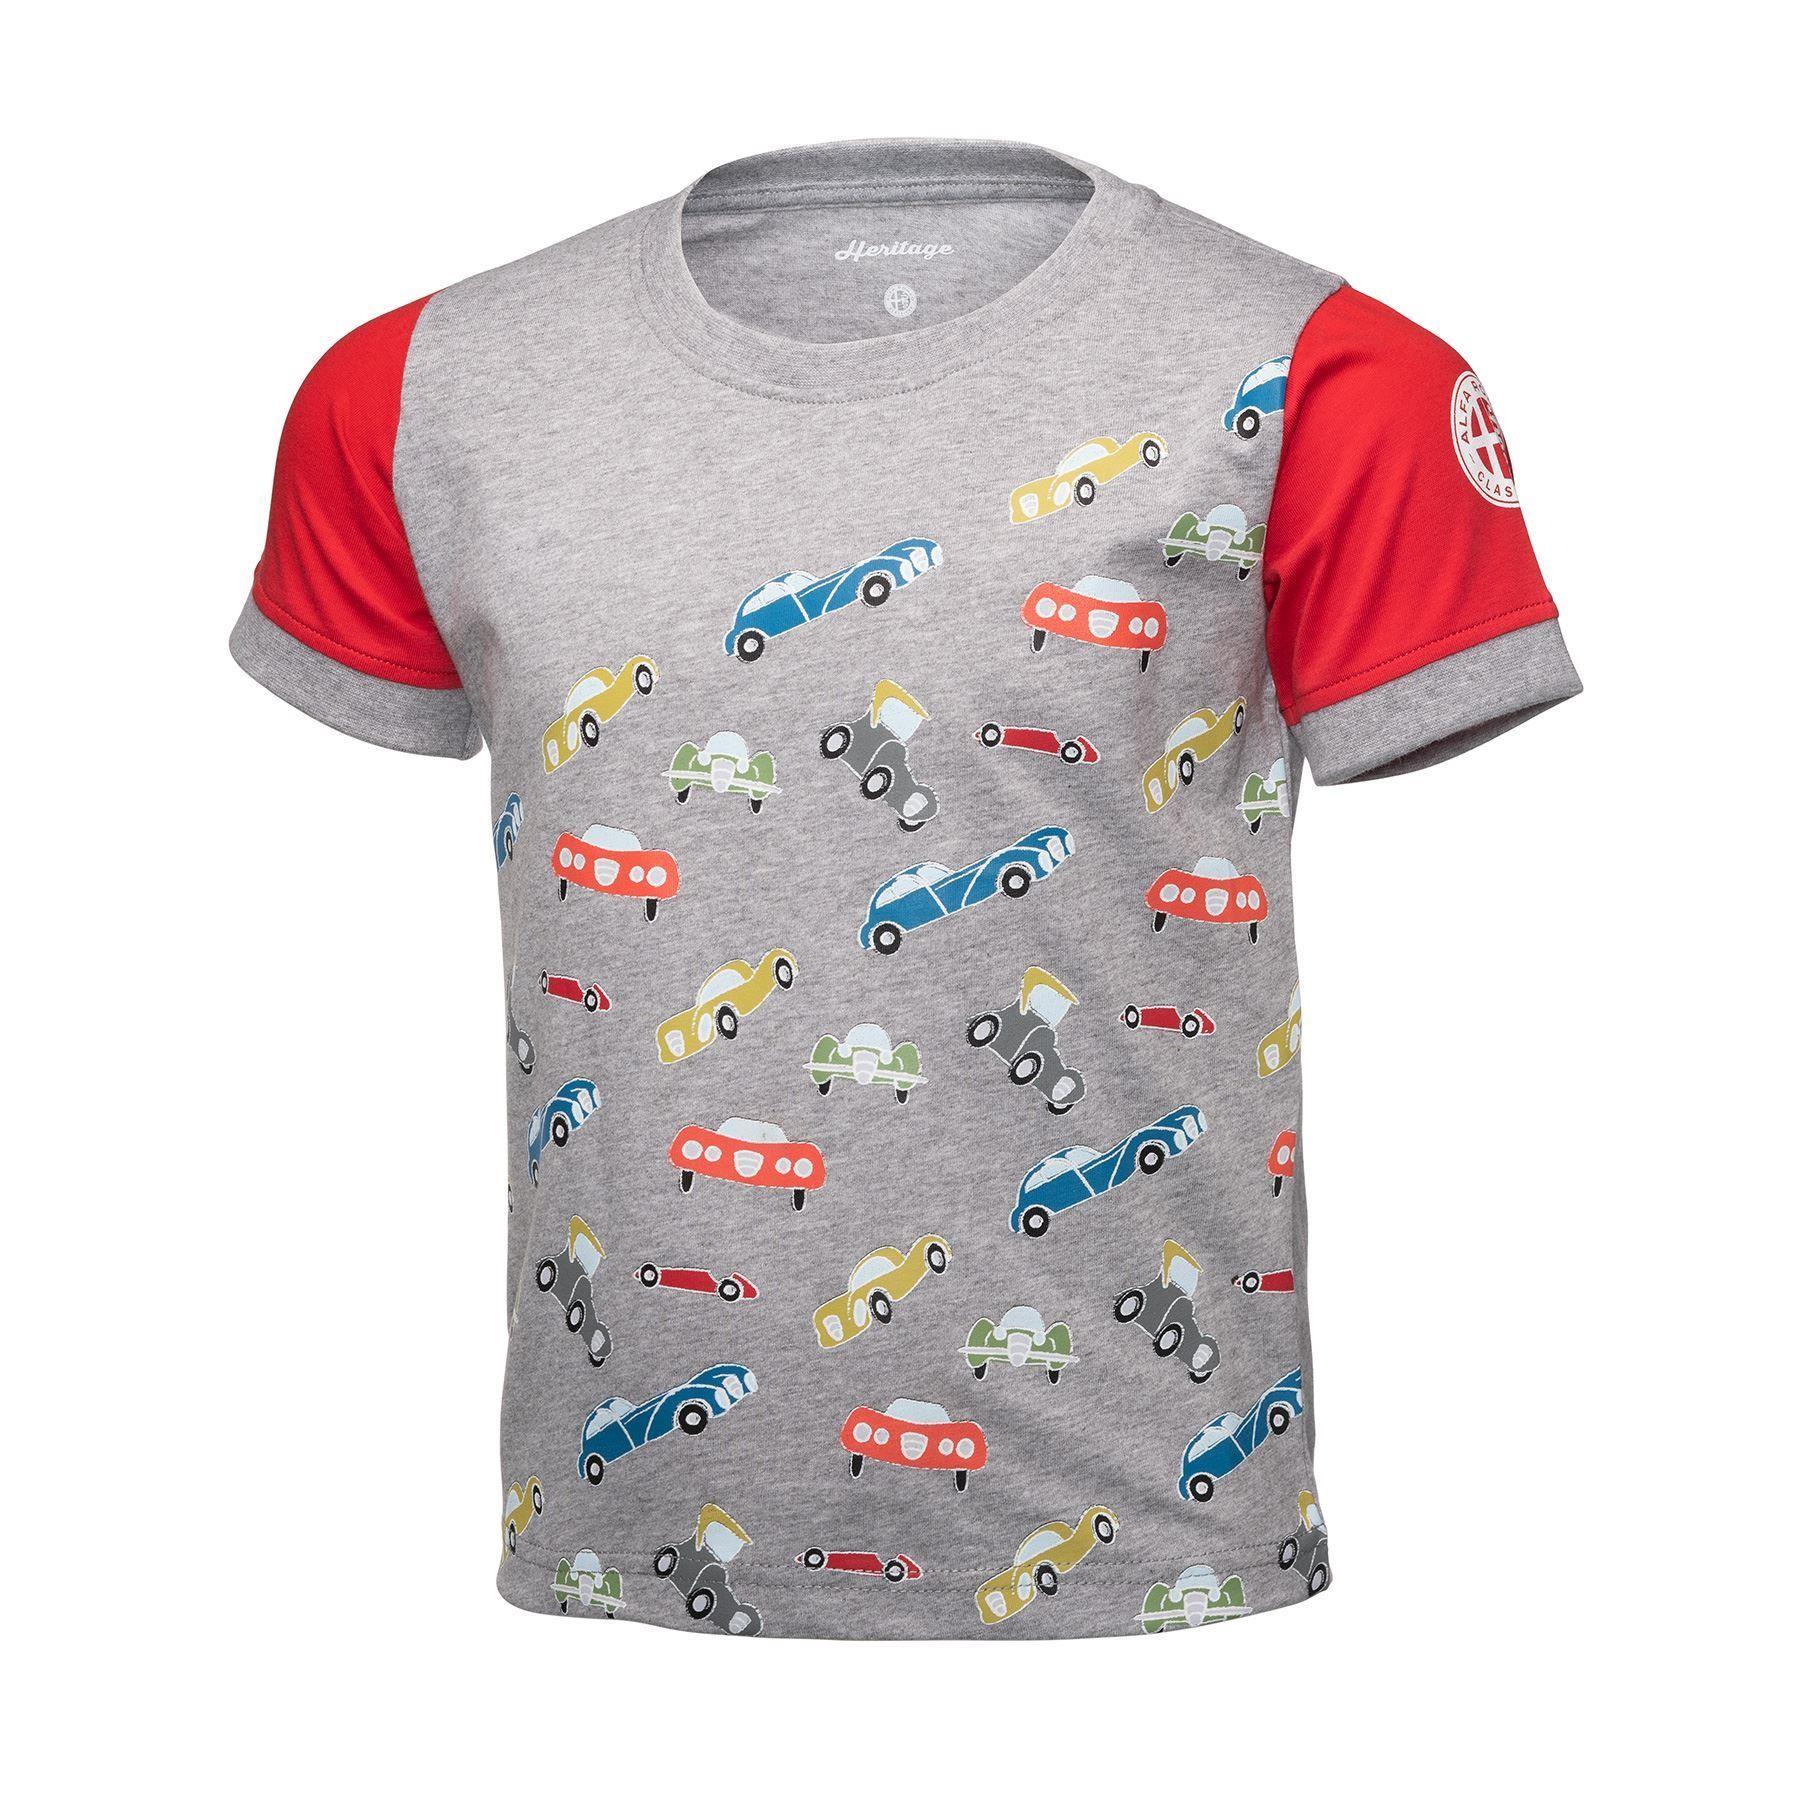 Heritage Kids/Children T-Shirt - Size 3-4 Years